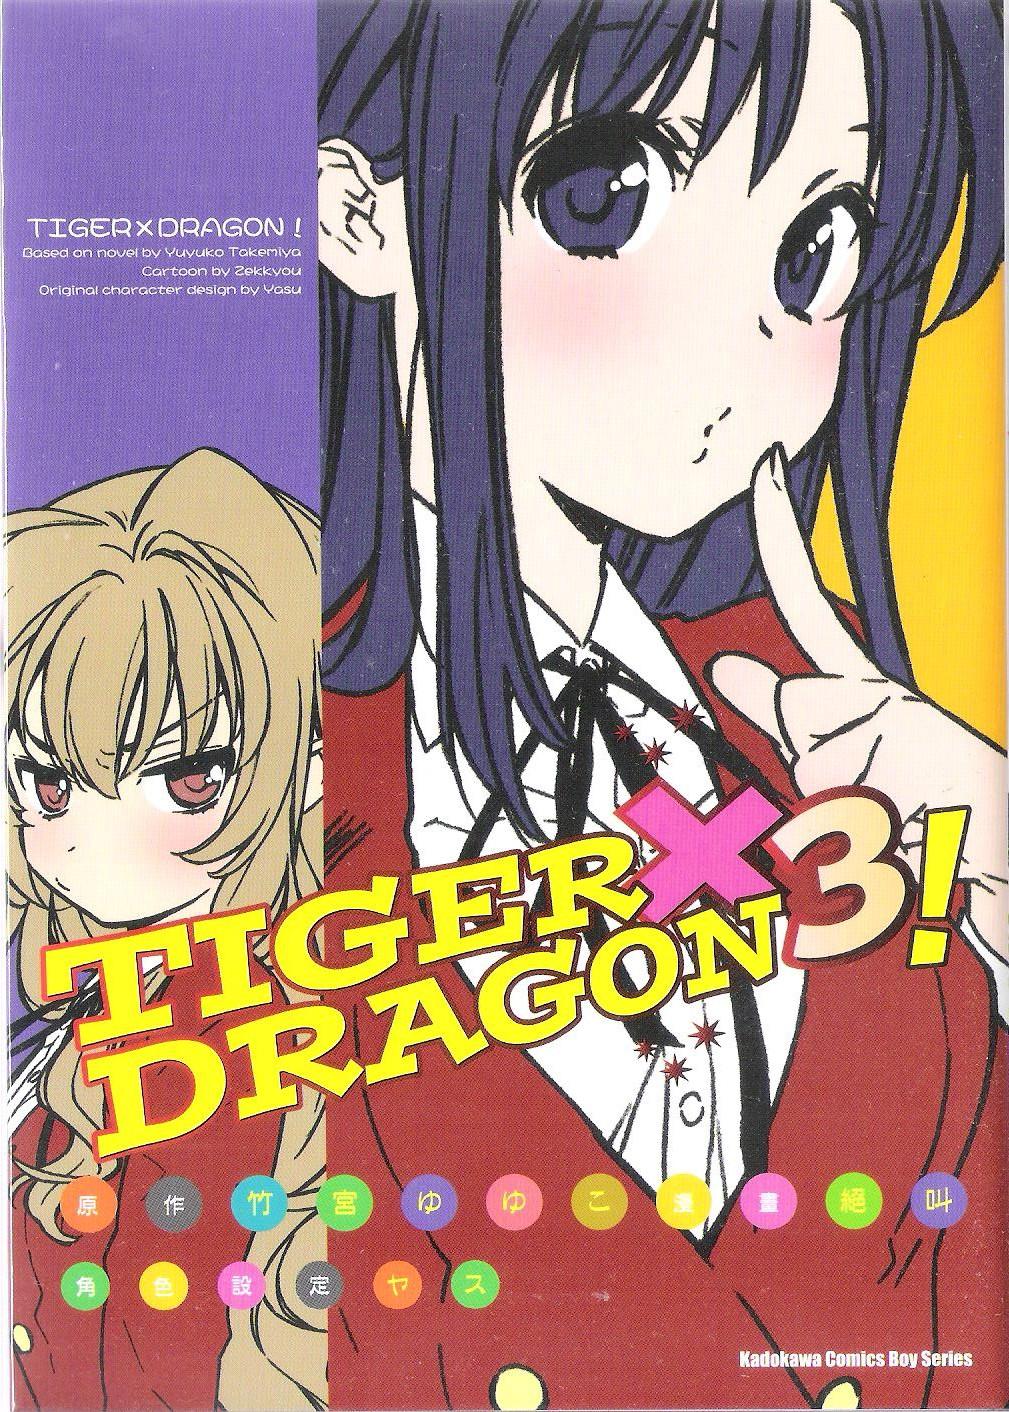 TIGERxDRAGON 3!